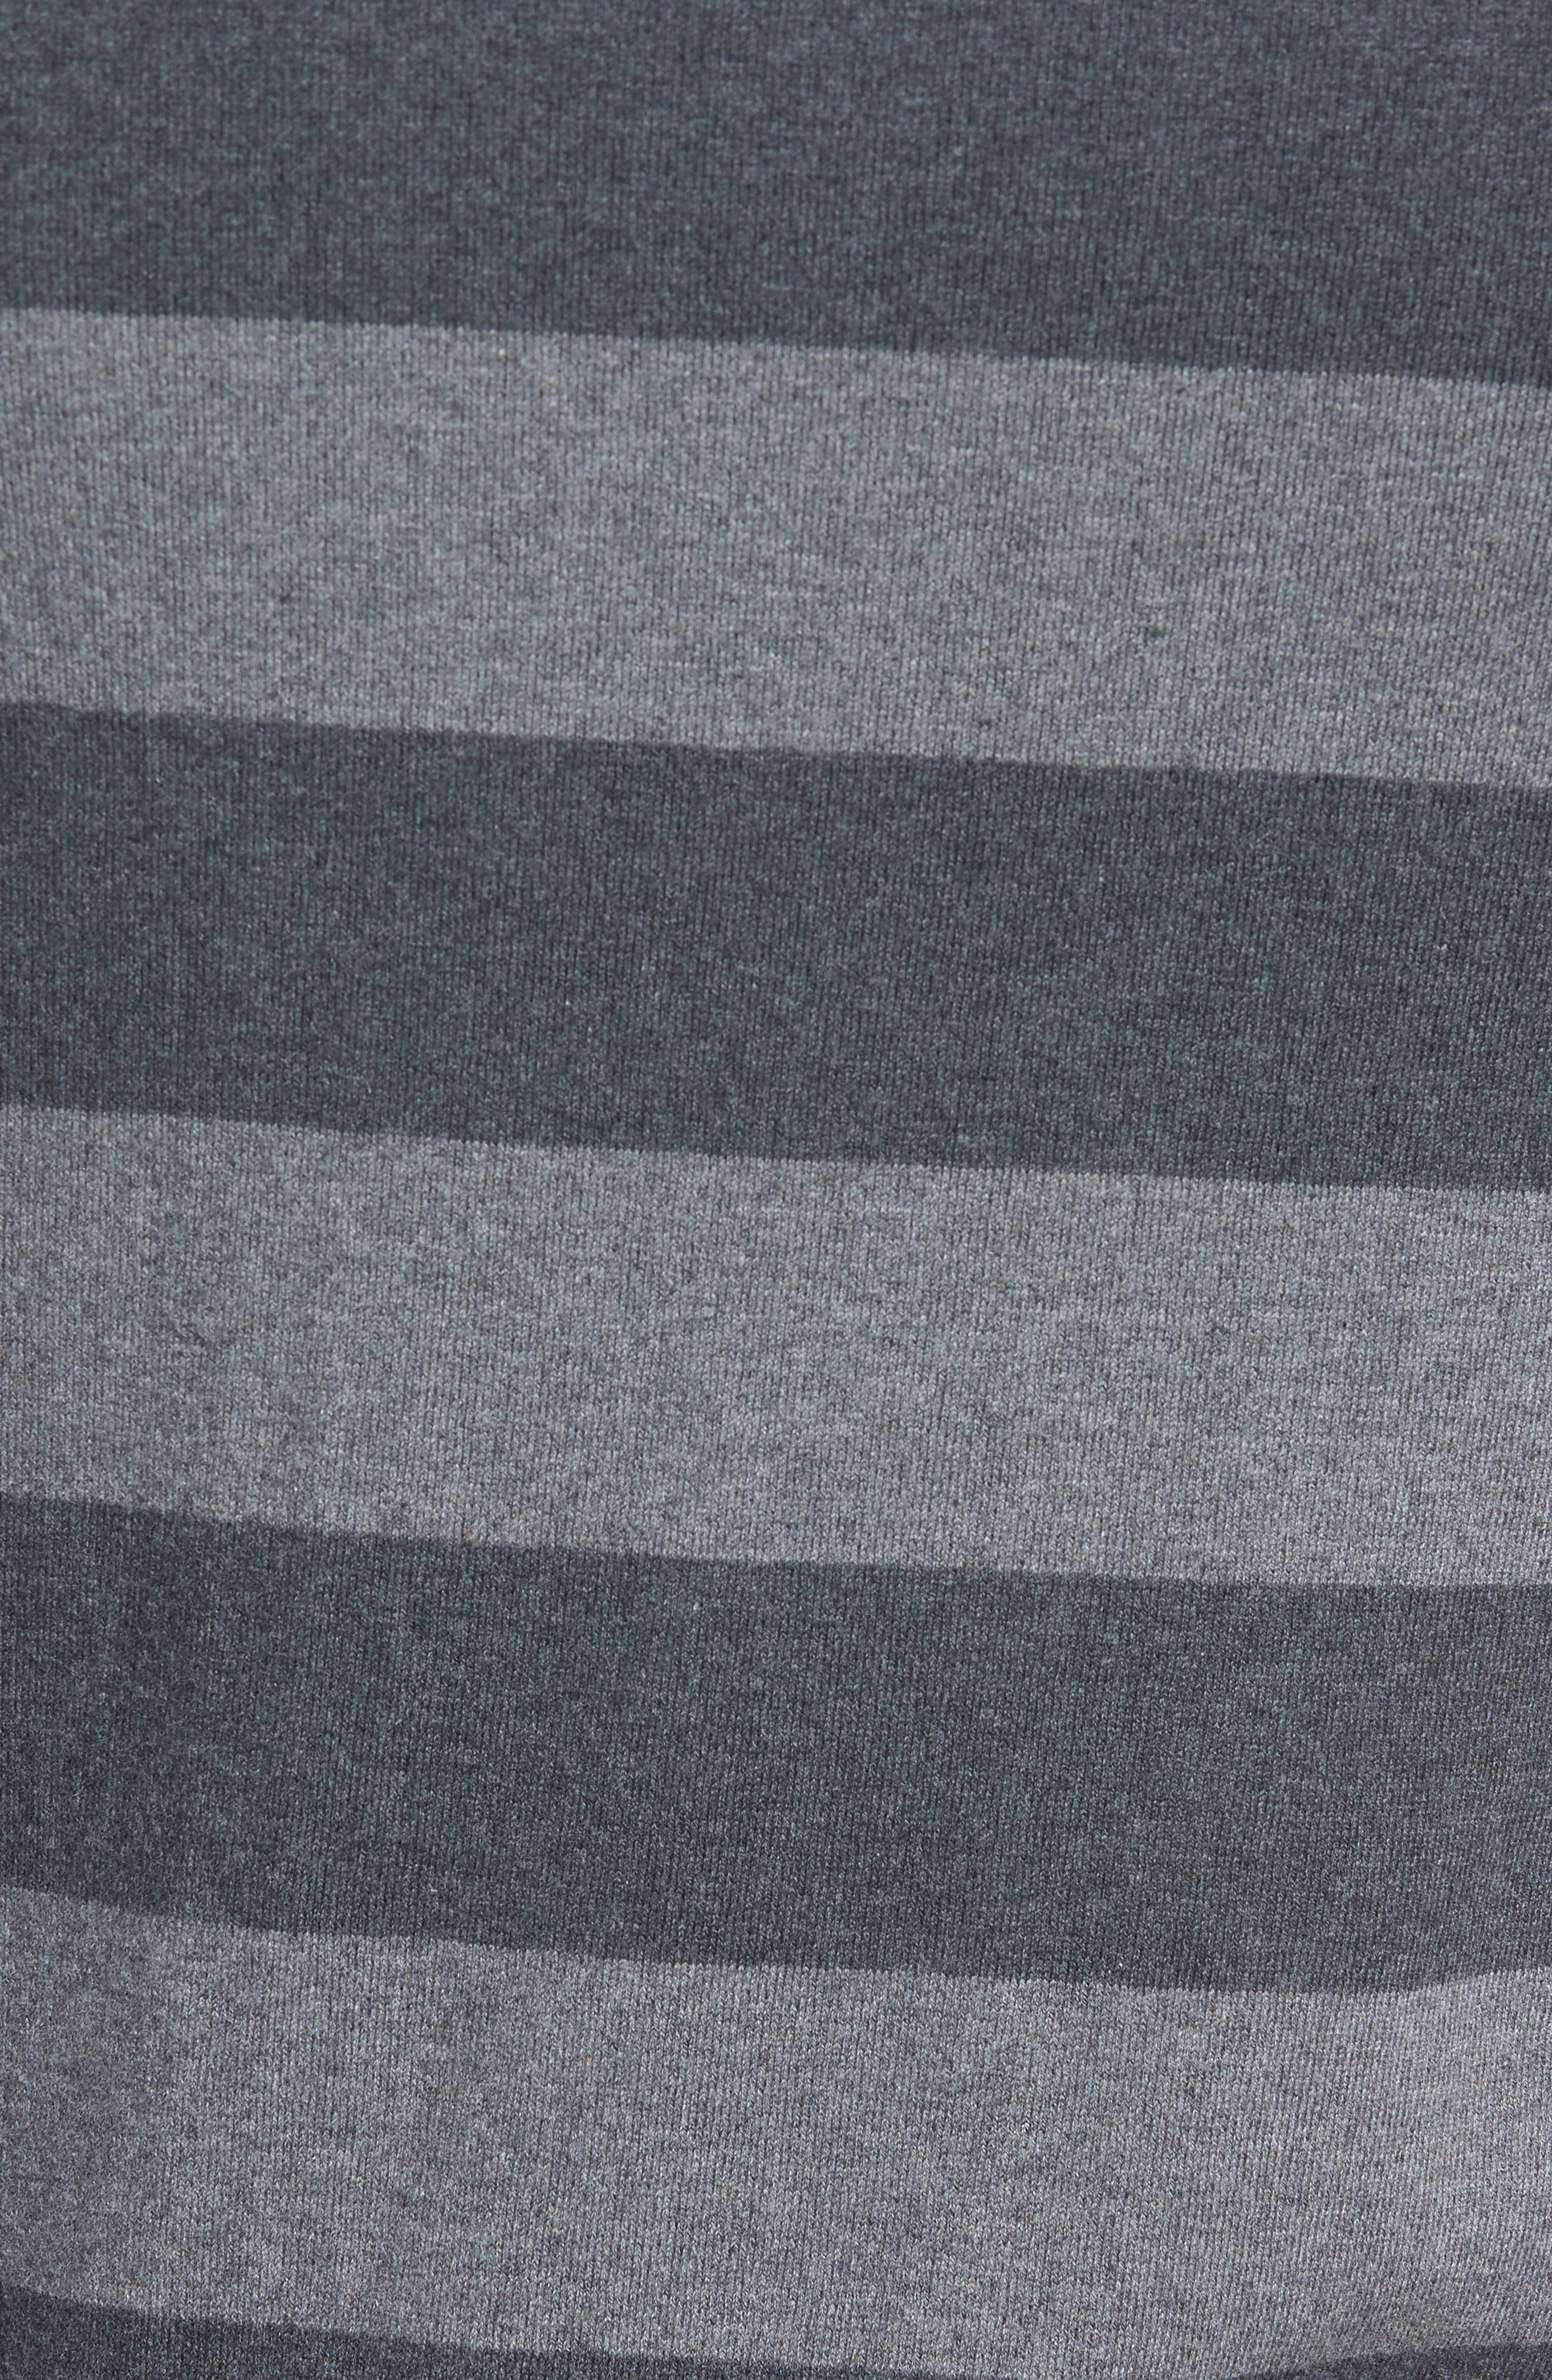 Stripe Stretch Cotton Sweater,                             Alternate thumbnail 5, color,                             Mid Grey/ Charcoal Melange